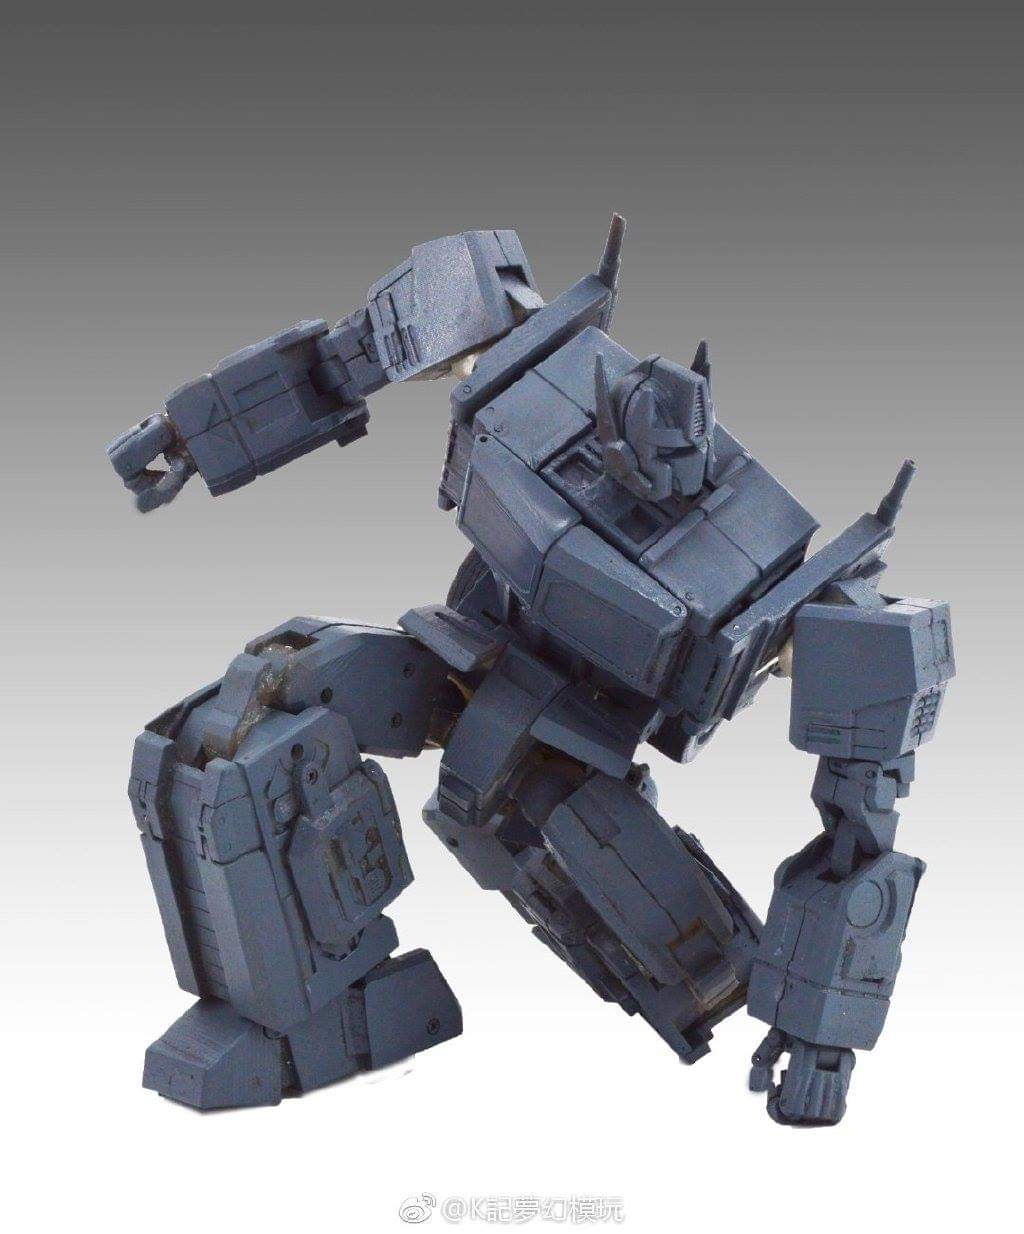 [KFC Toys] Produit Tiers - PC-14 Raijin + PC-15 Grand Raijin + P-16 Raiju - aka Ginrai (Powermaster Optimus) + Remorque de Ginrai + Godbomber = God Ginrai (TF Masterforce) AslWJl8o_o